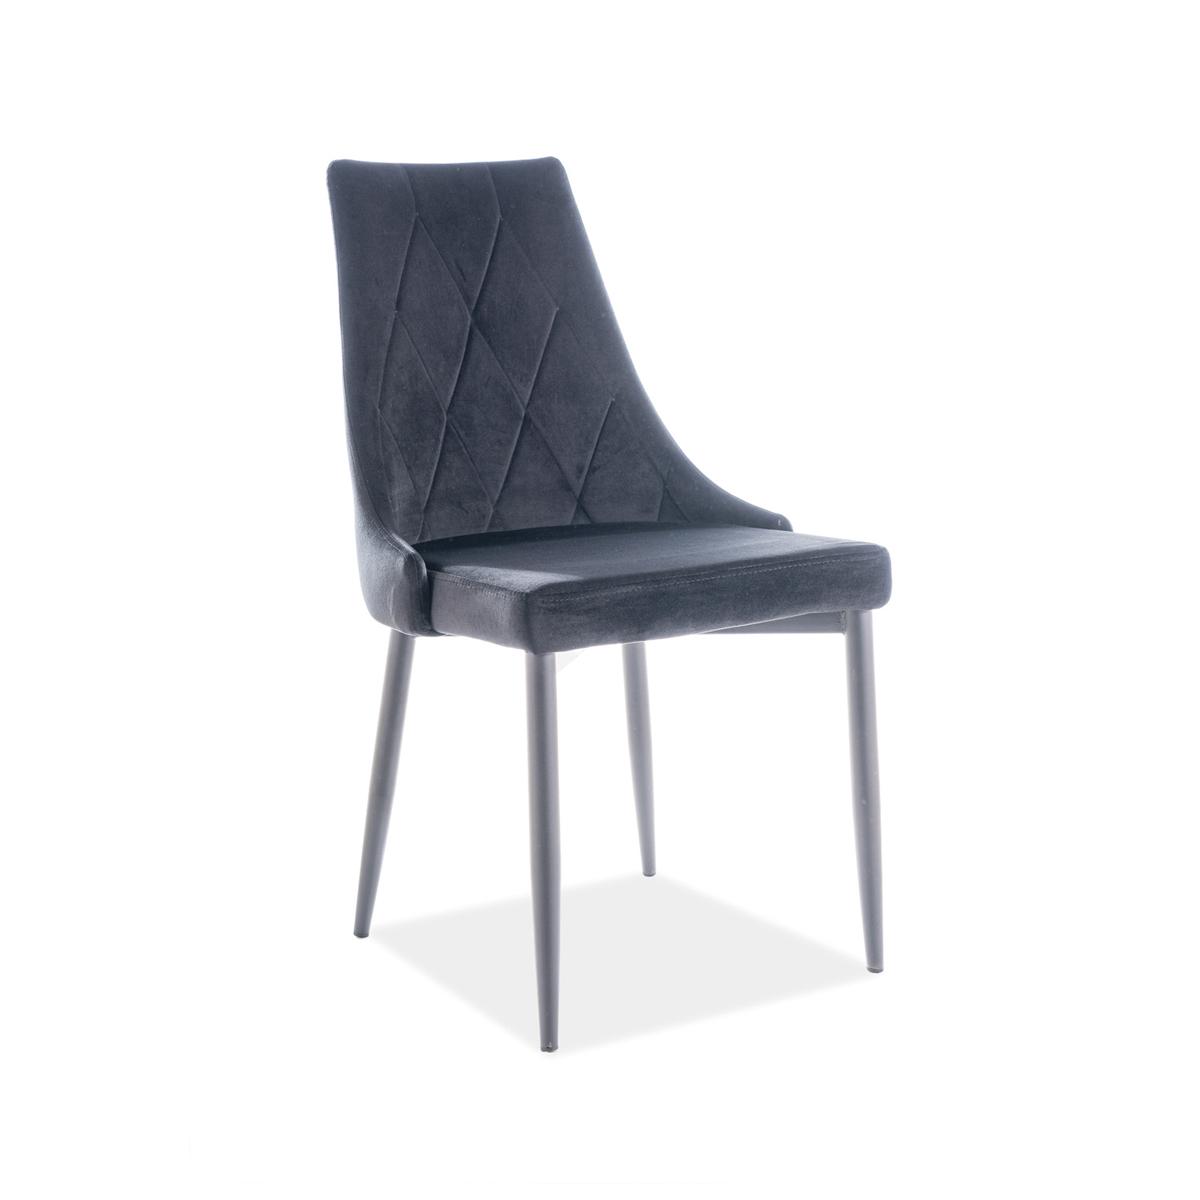 Stuhl Celine Samt schwarz